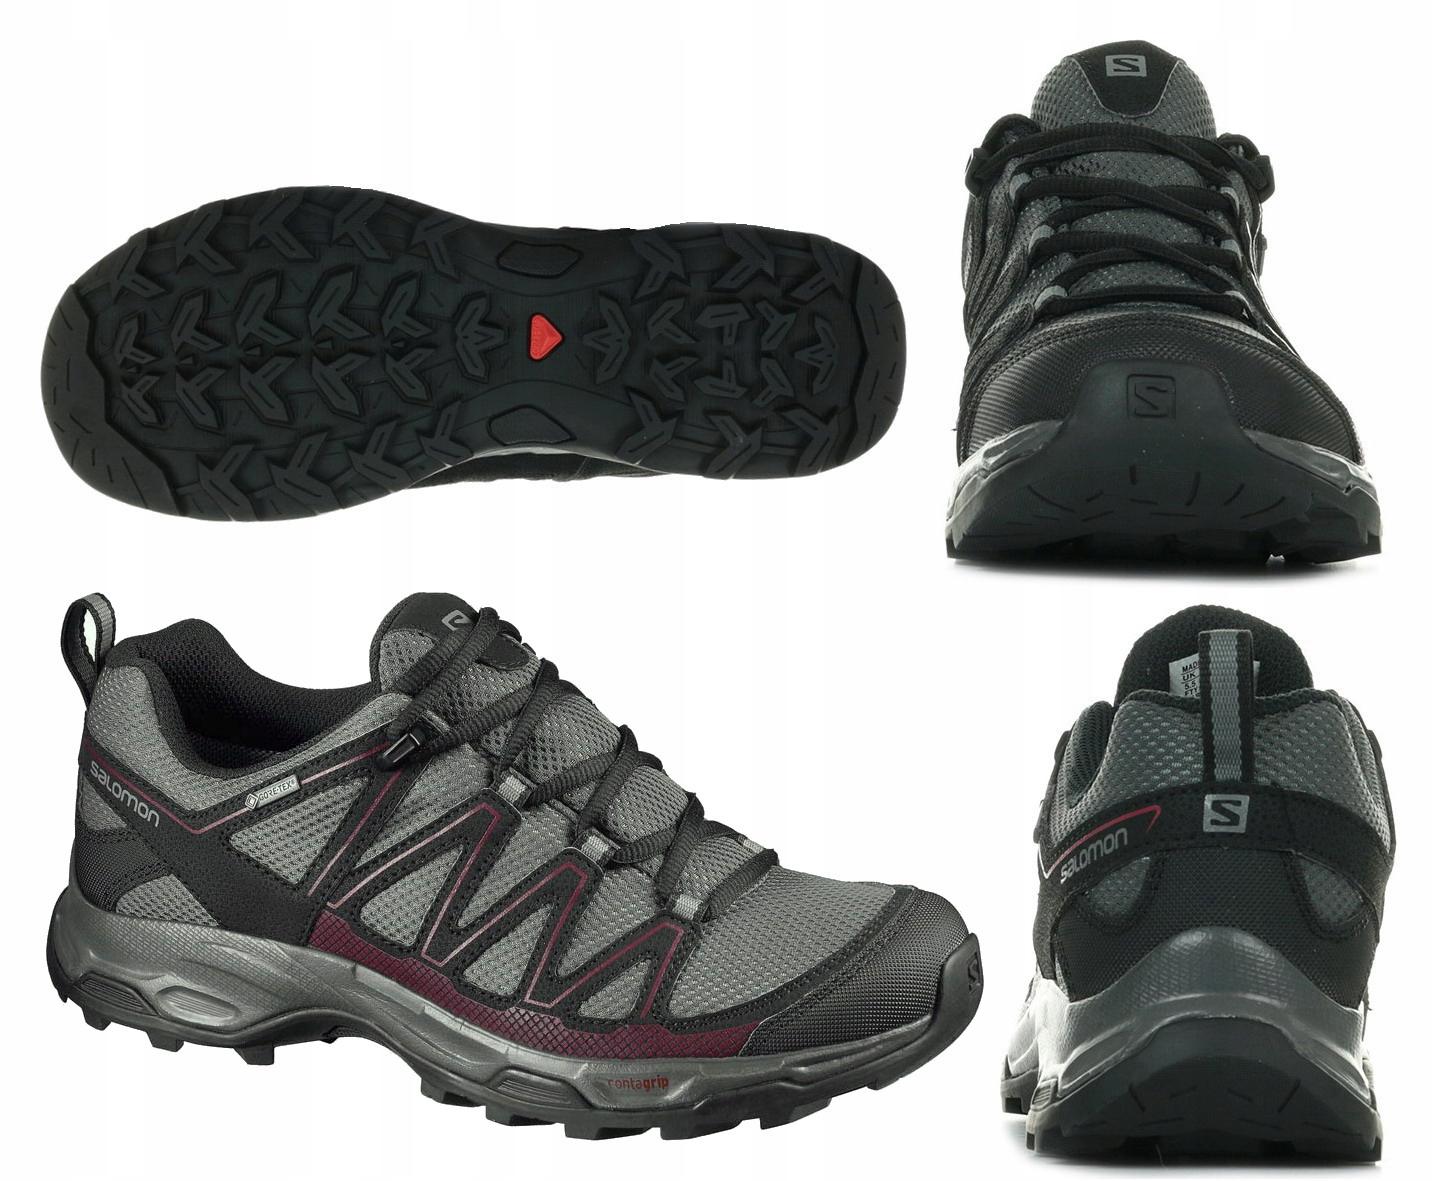 Salomon Wentwood GTX buty trekking damskie - 40